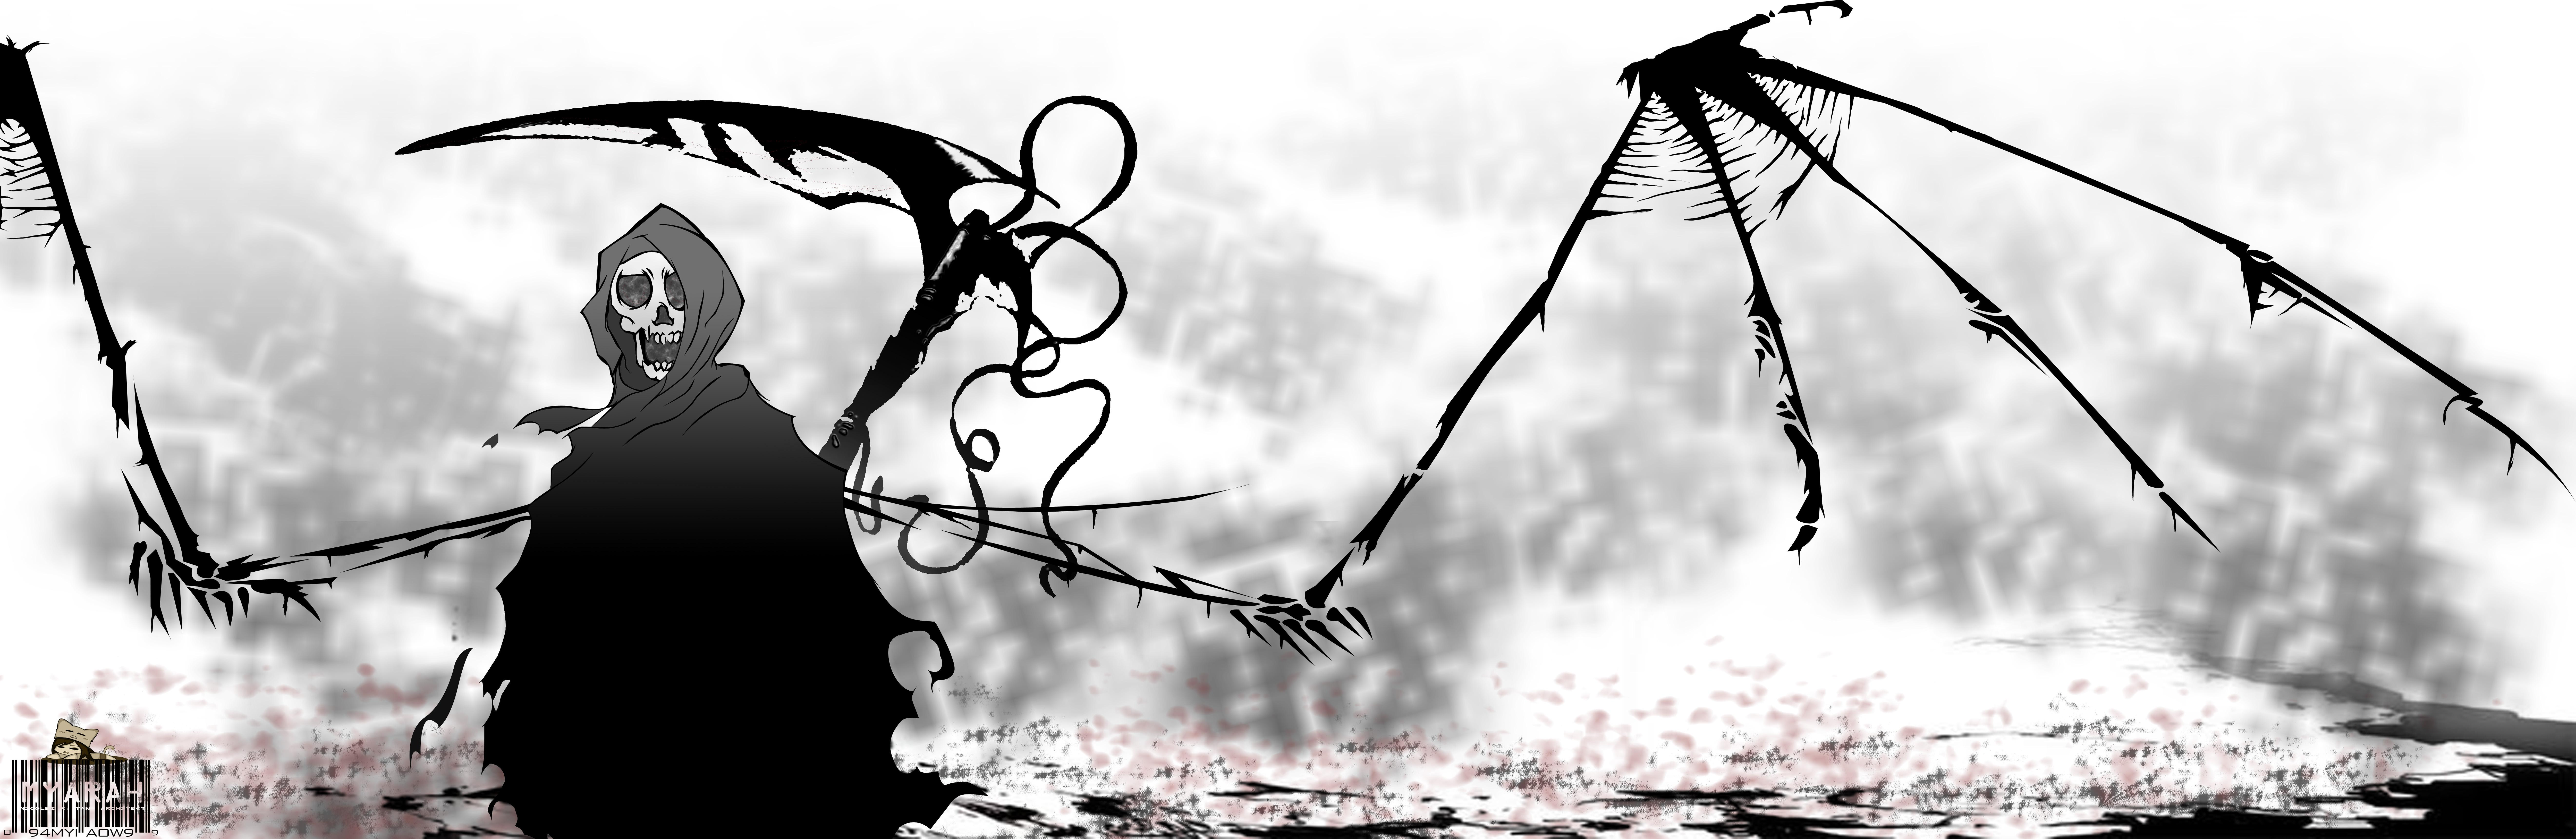 Grim reaper by myiaow on deviantart for Buy digital art online